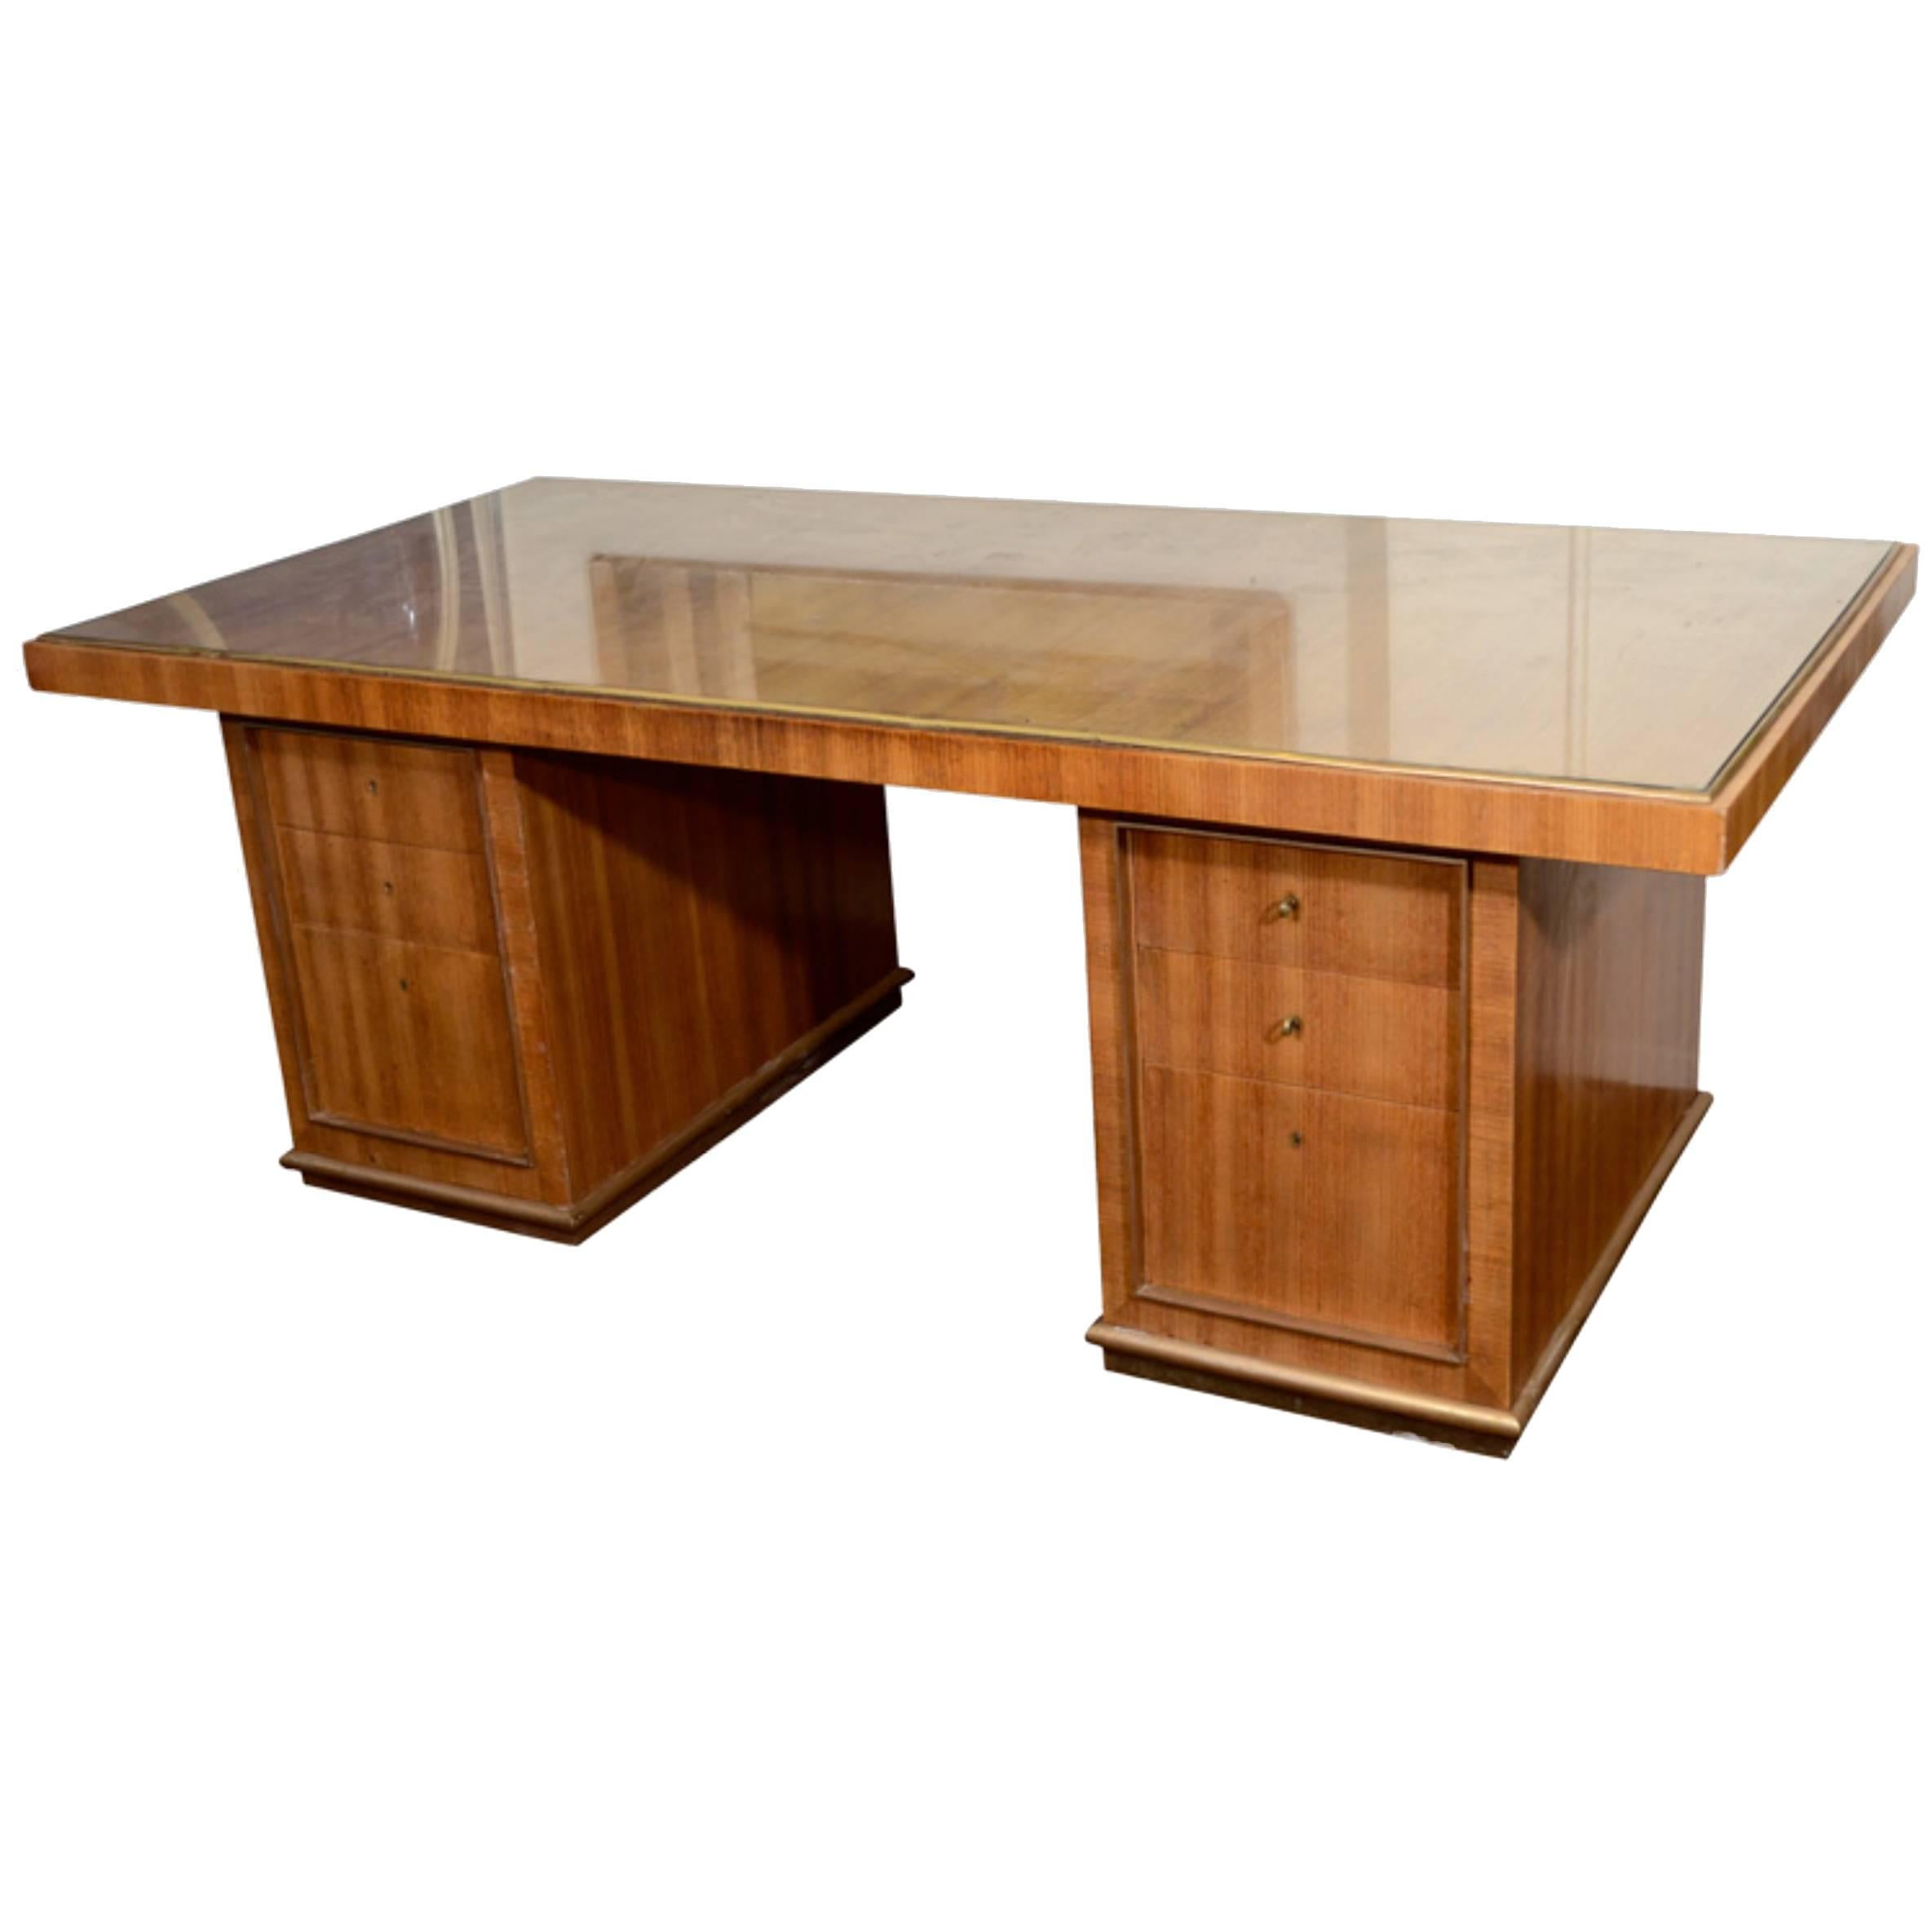 Desk by Jean Royère, France, 1940's